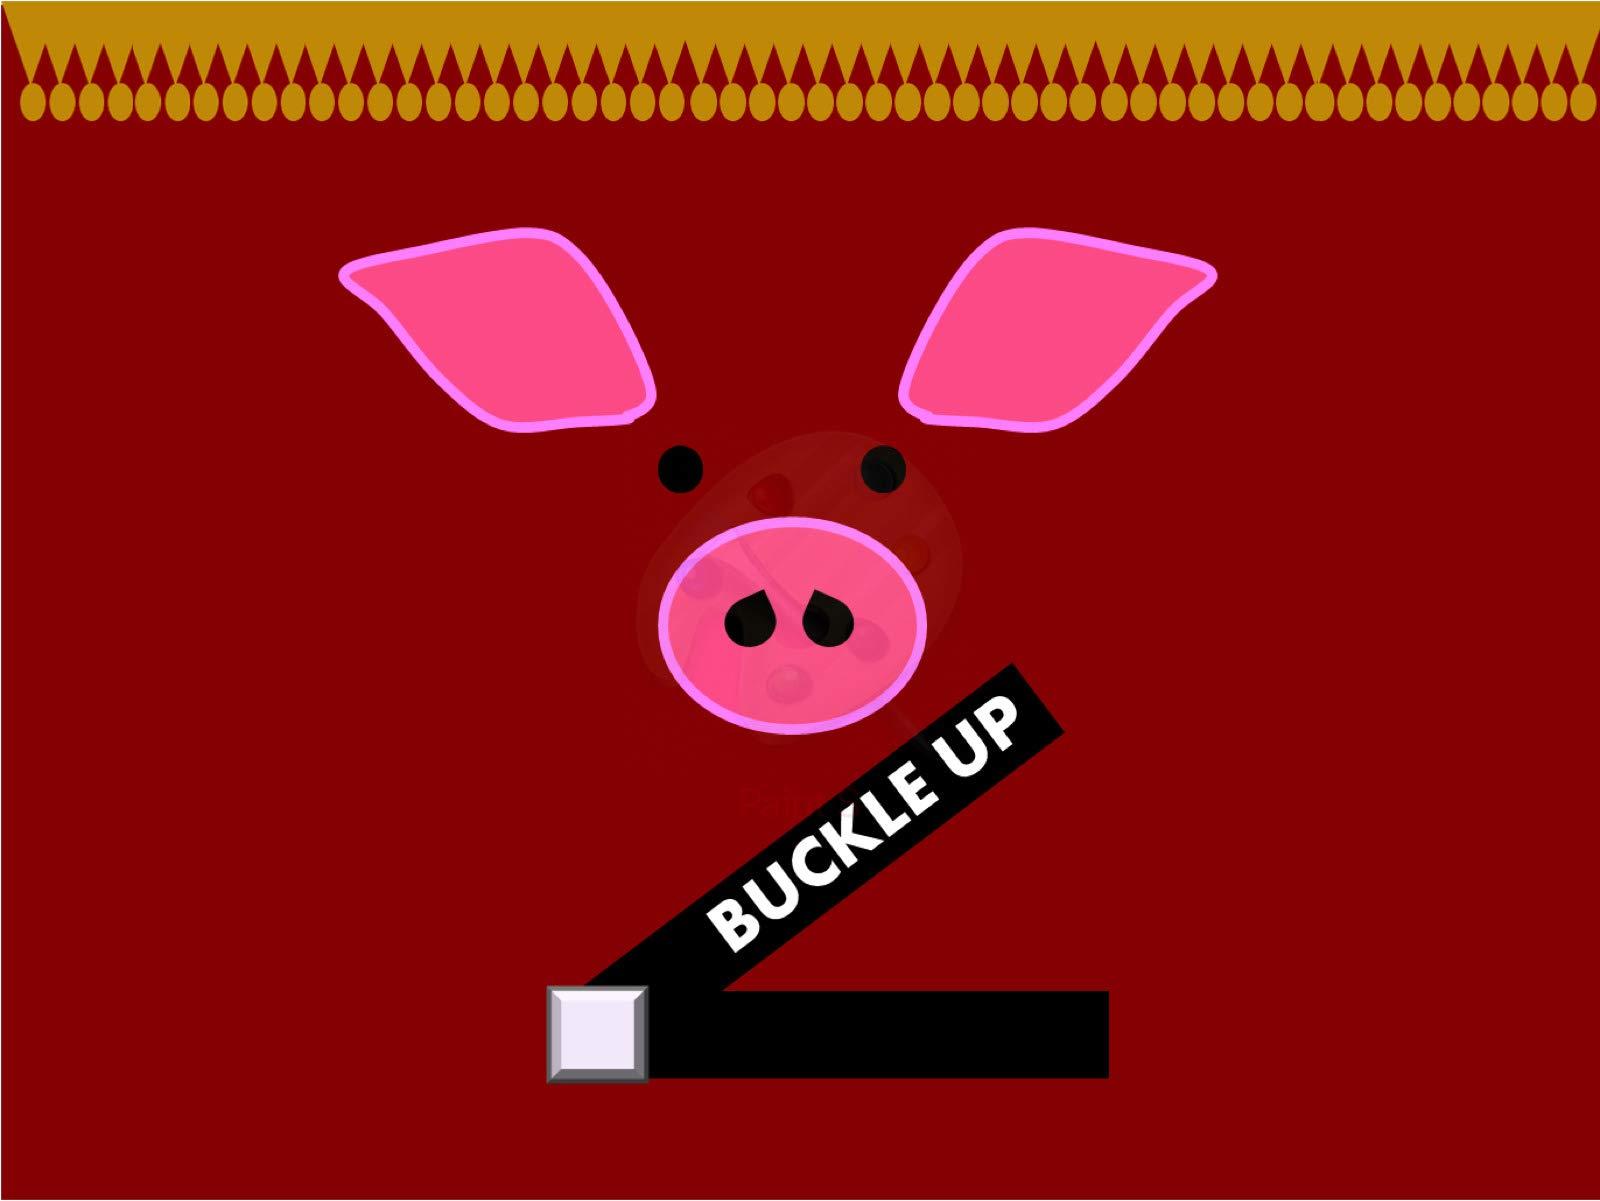 Buckle Up - Season 1